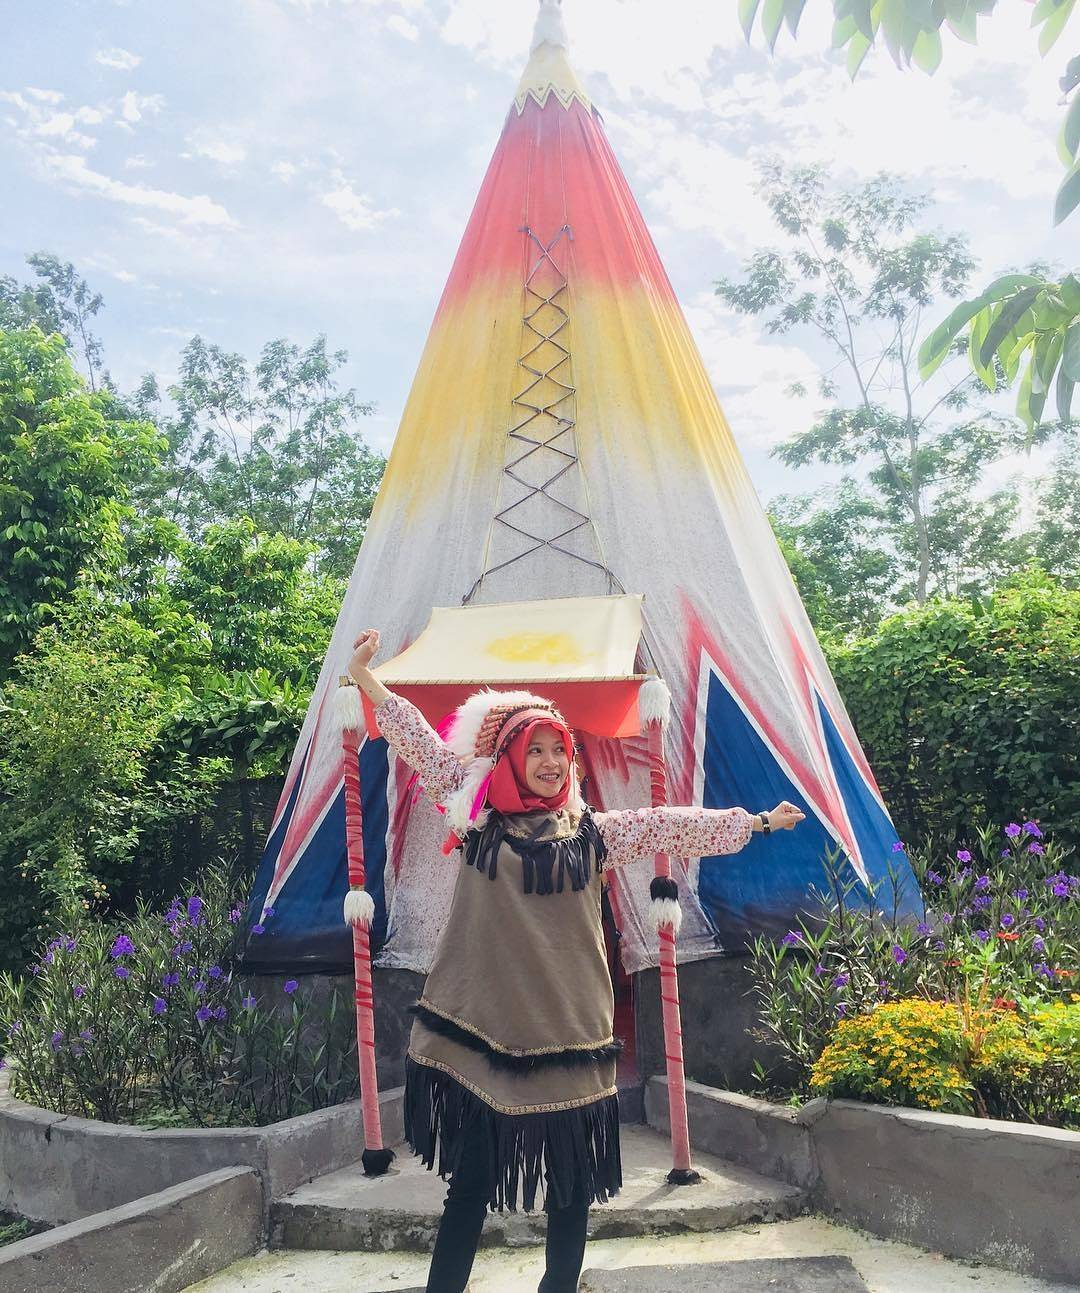 Alamat Harga Tiket Masuk Kampung Indian Ngancar Kediri Wisata Kab